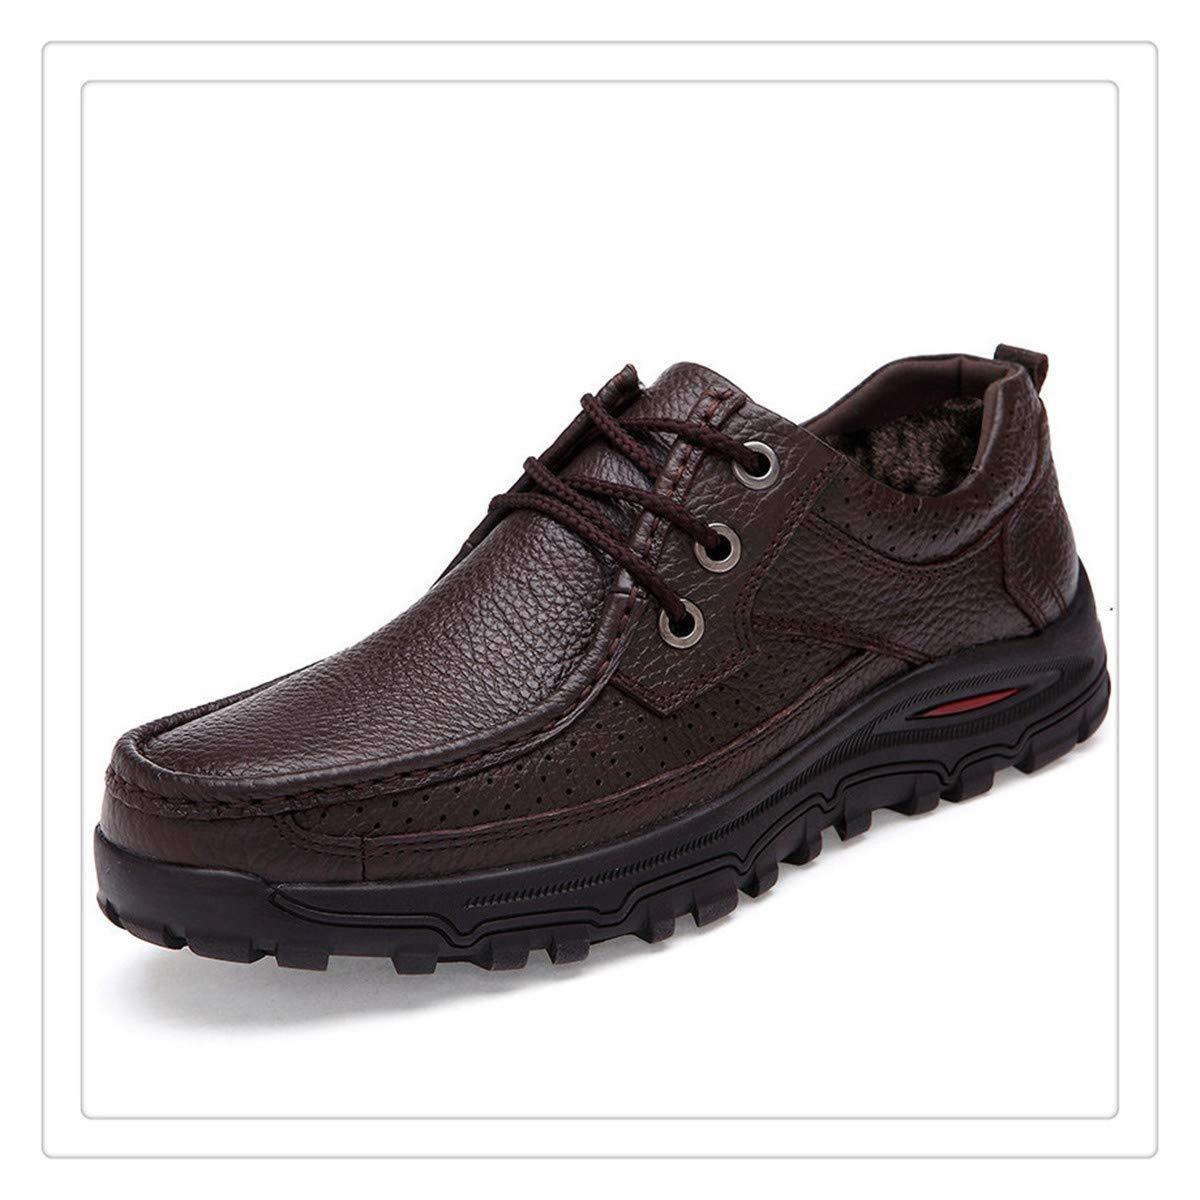 Genuine Leather Warm Men Boots,Comfortable Ankle Men Shoes,Quality Snow Boots